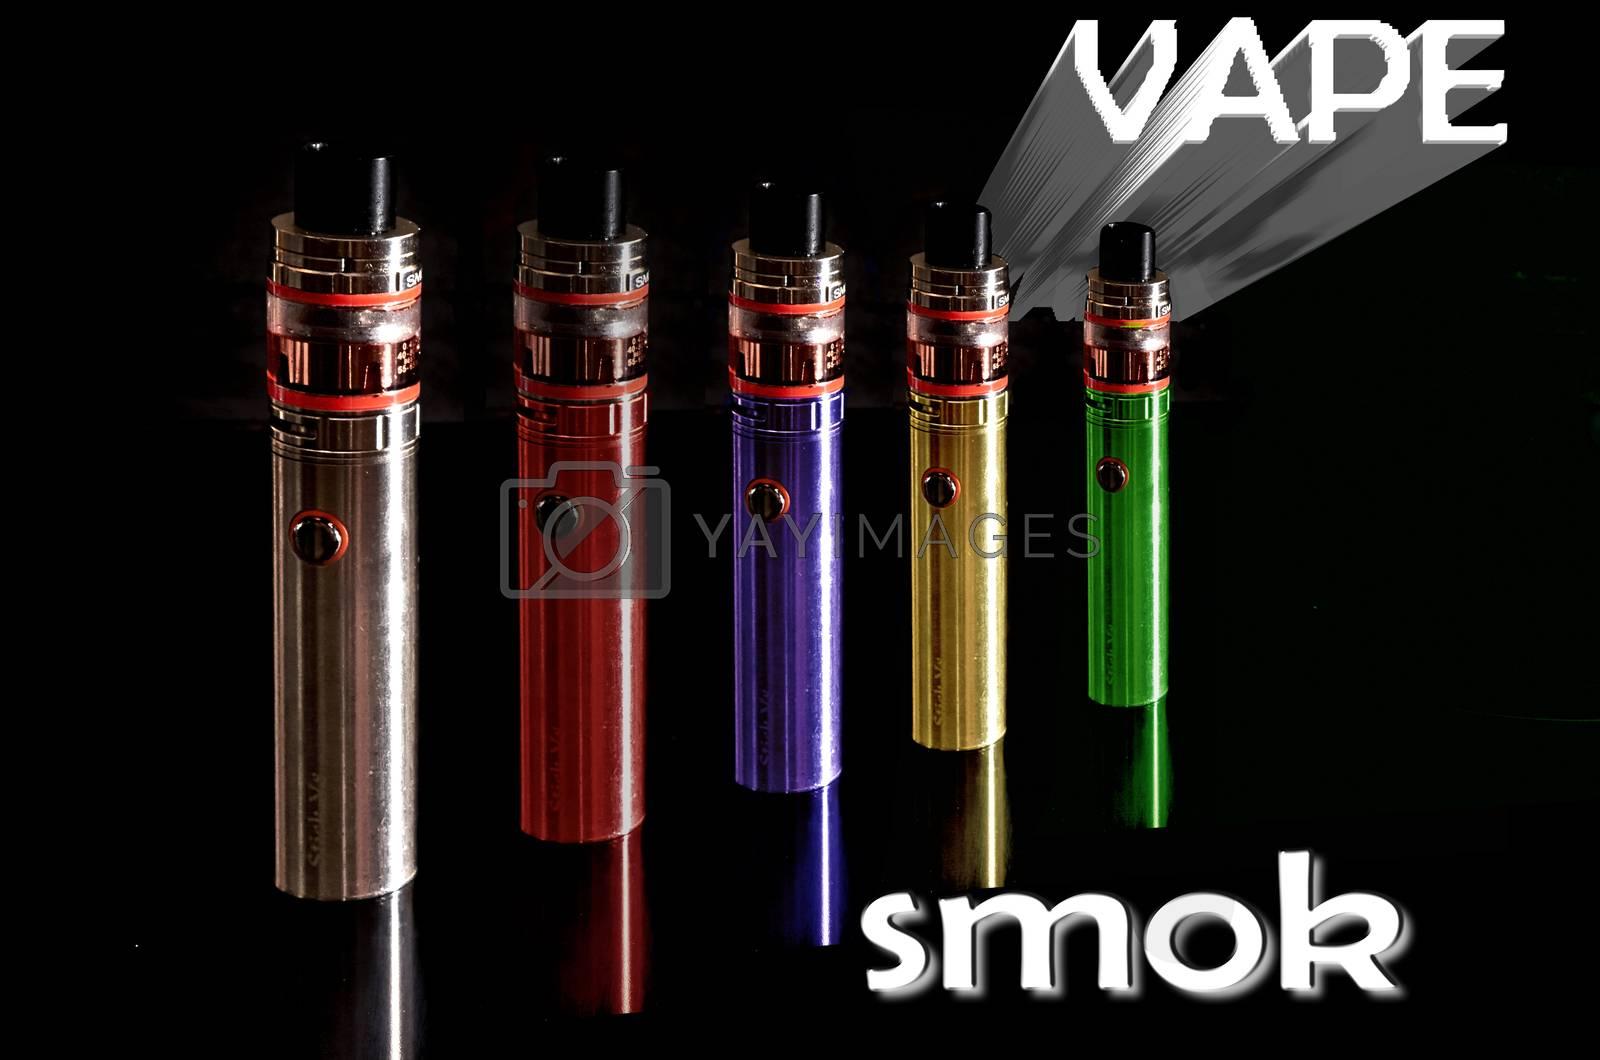 Vaper of colors smoke reflexions